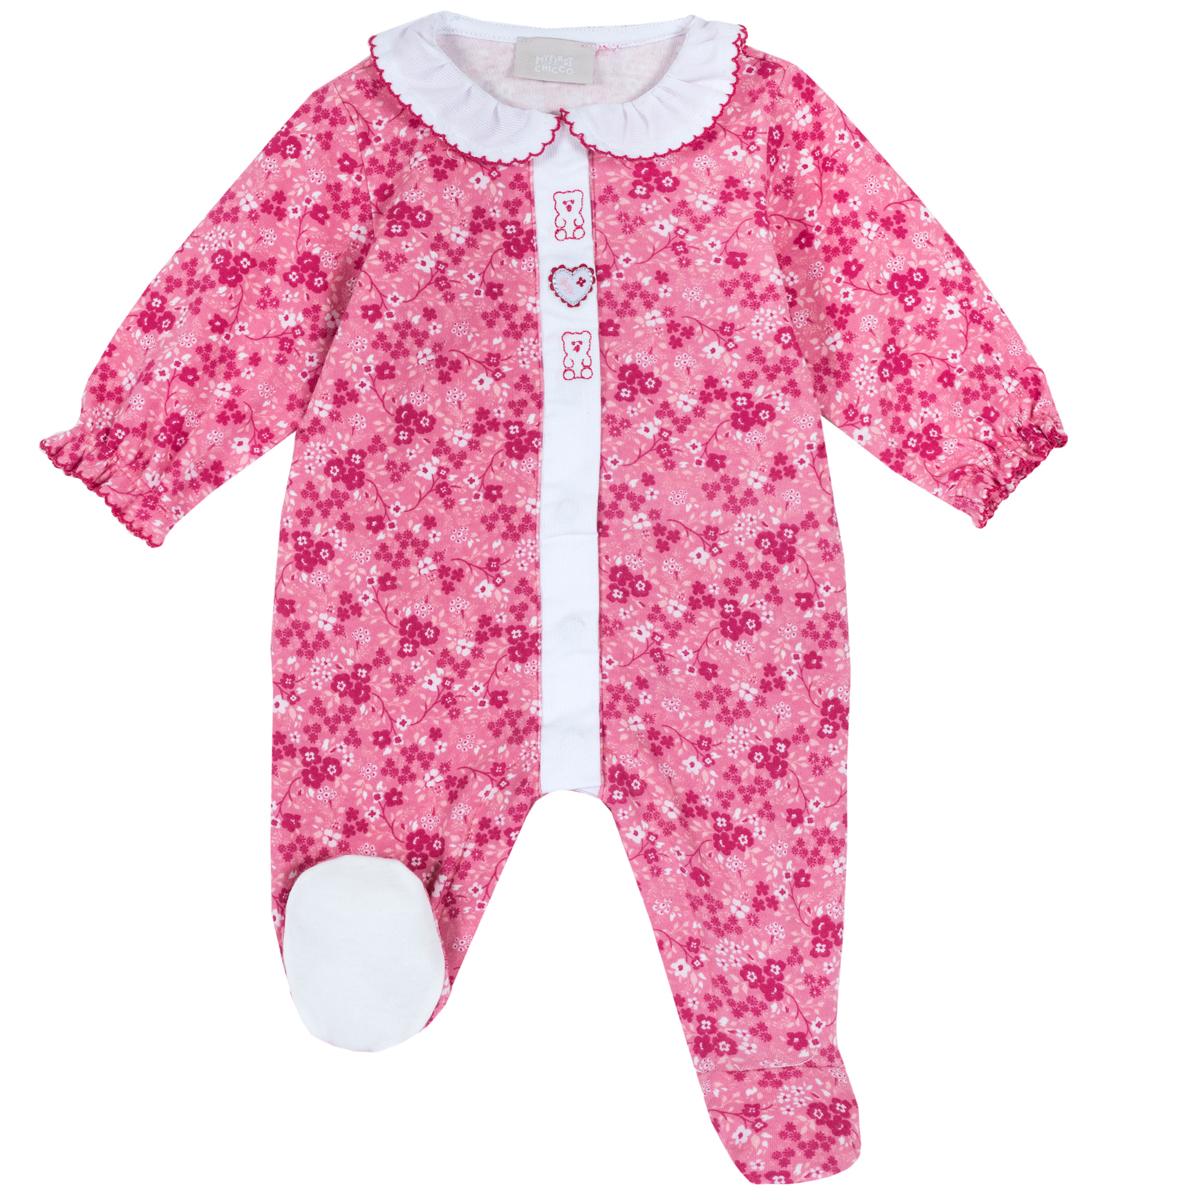 Salopeta copii Chicco, roz, imprimeu floral, 21896 din categoria Salopete/Body